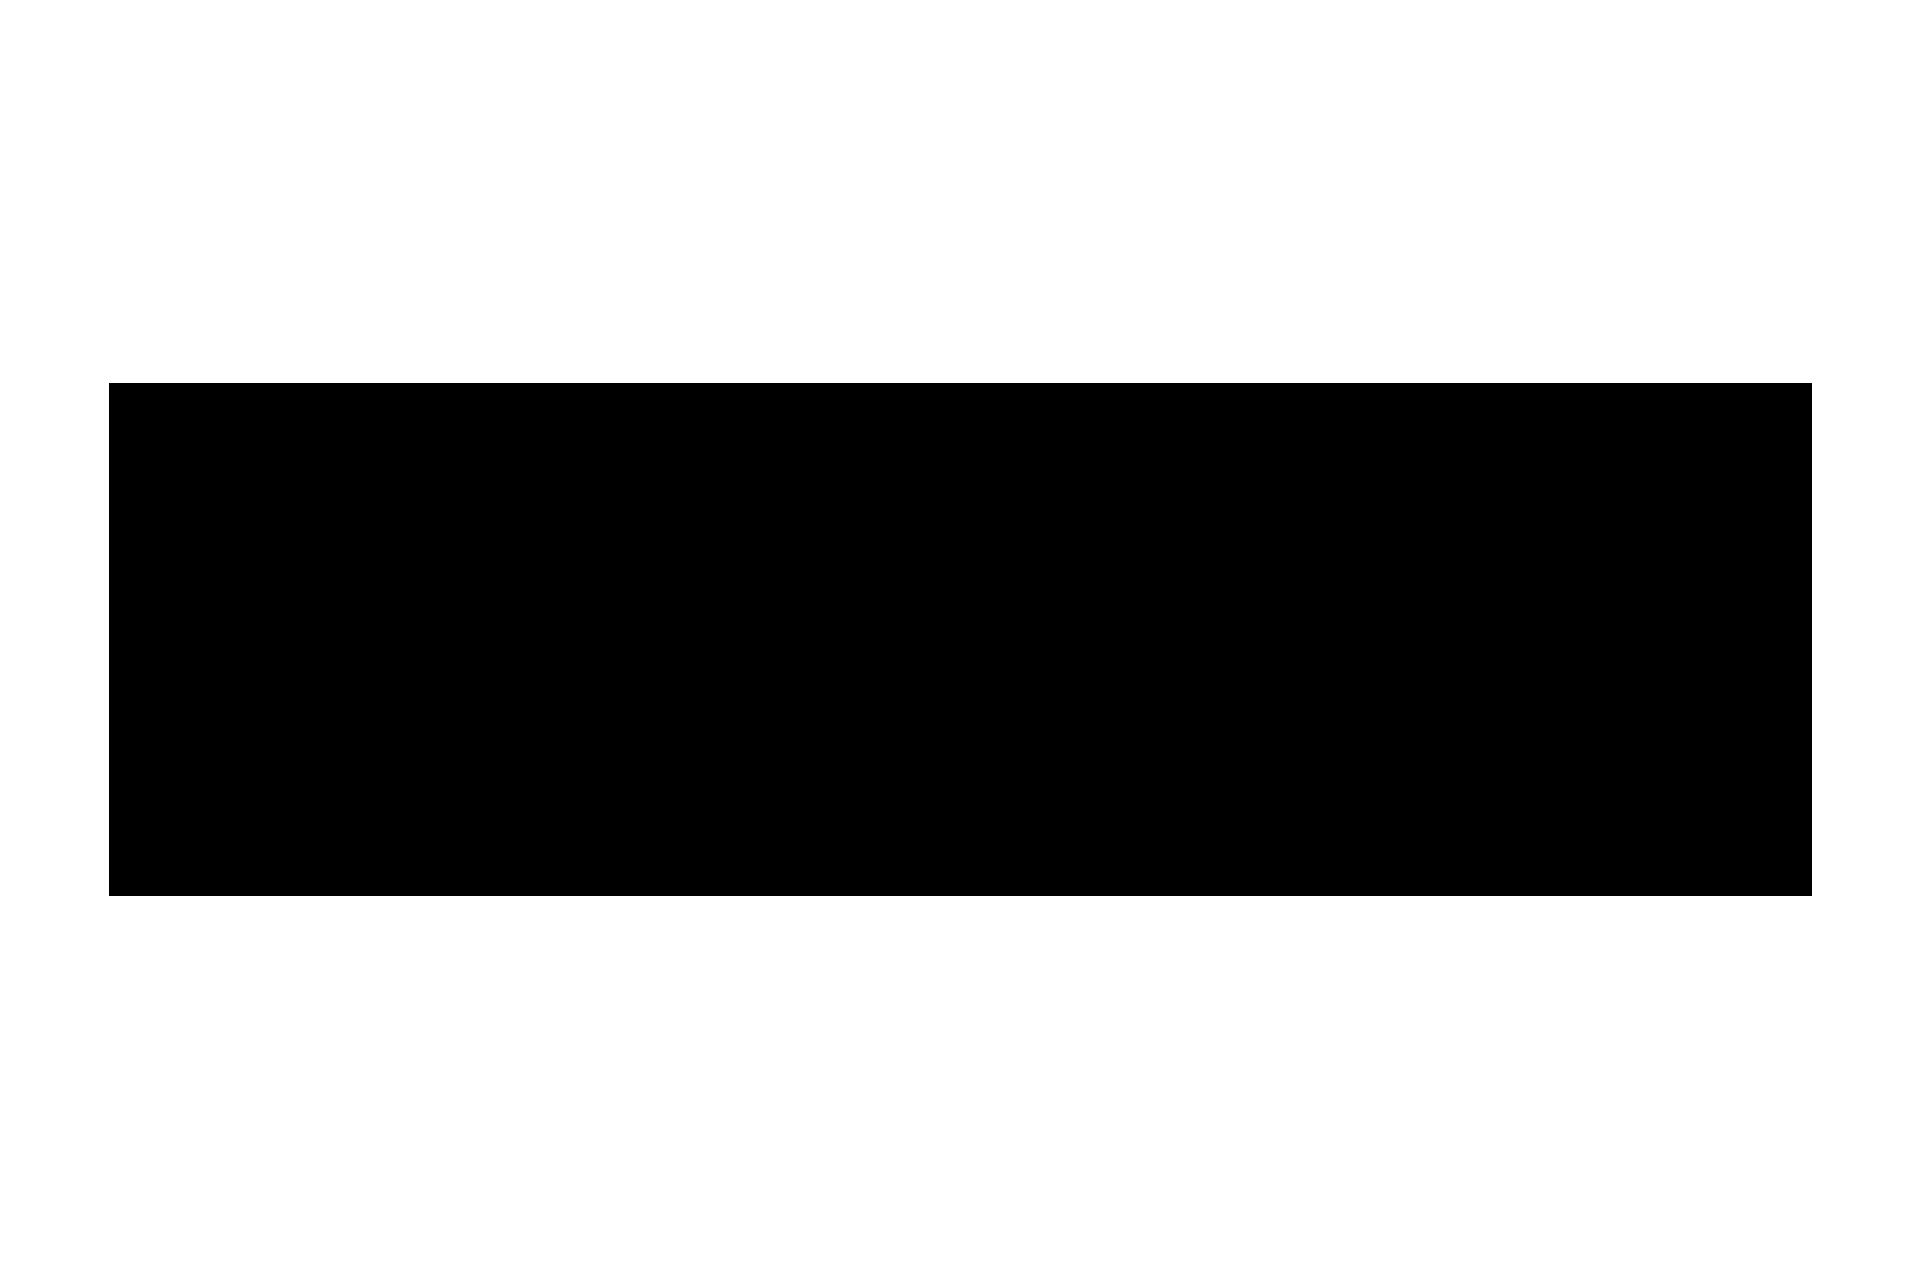 HEKACORP